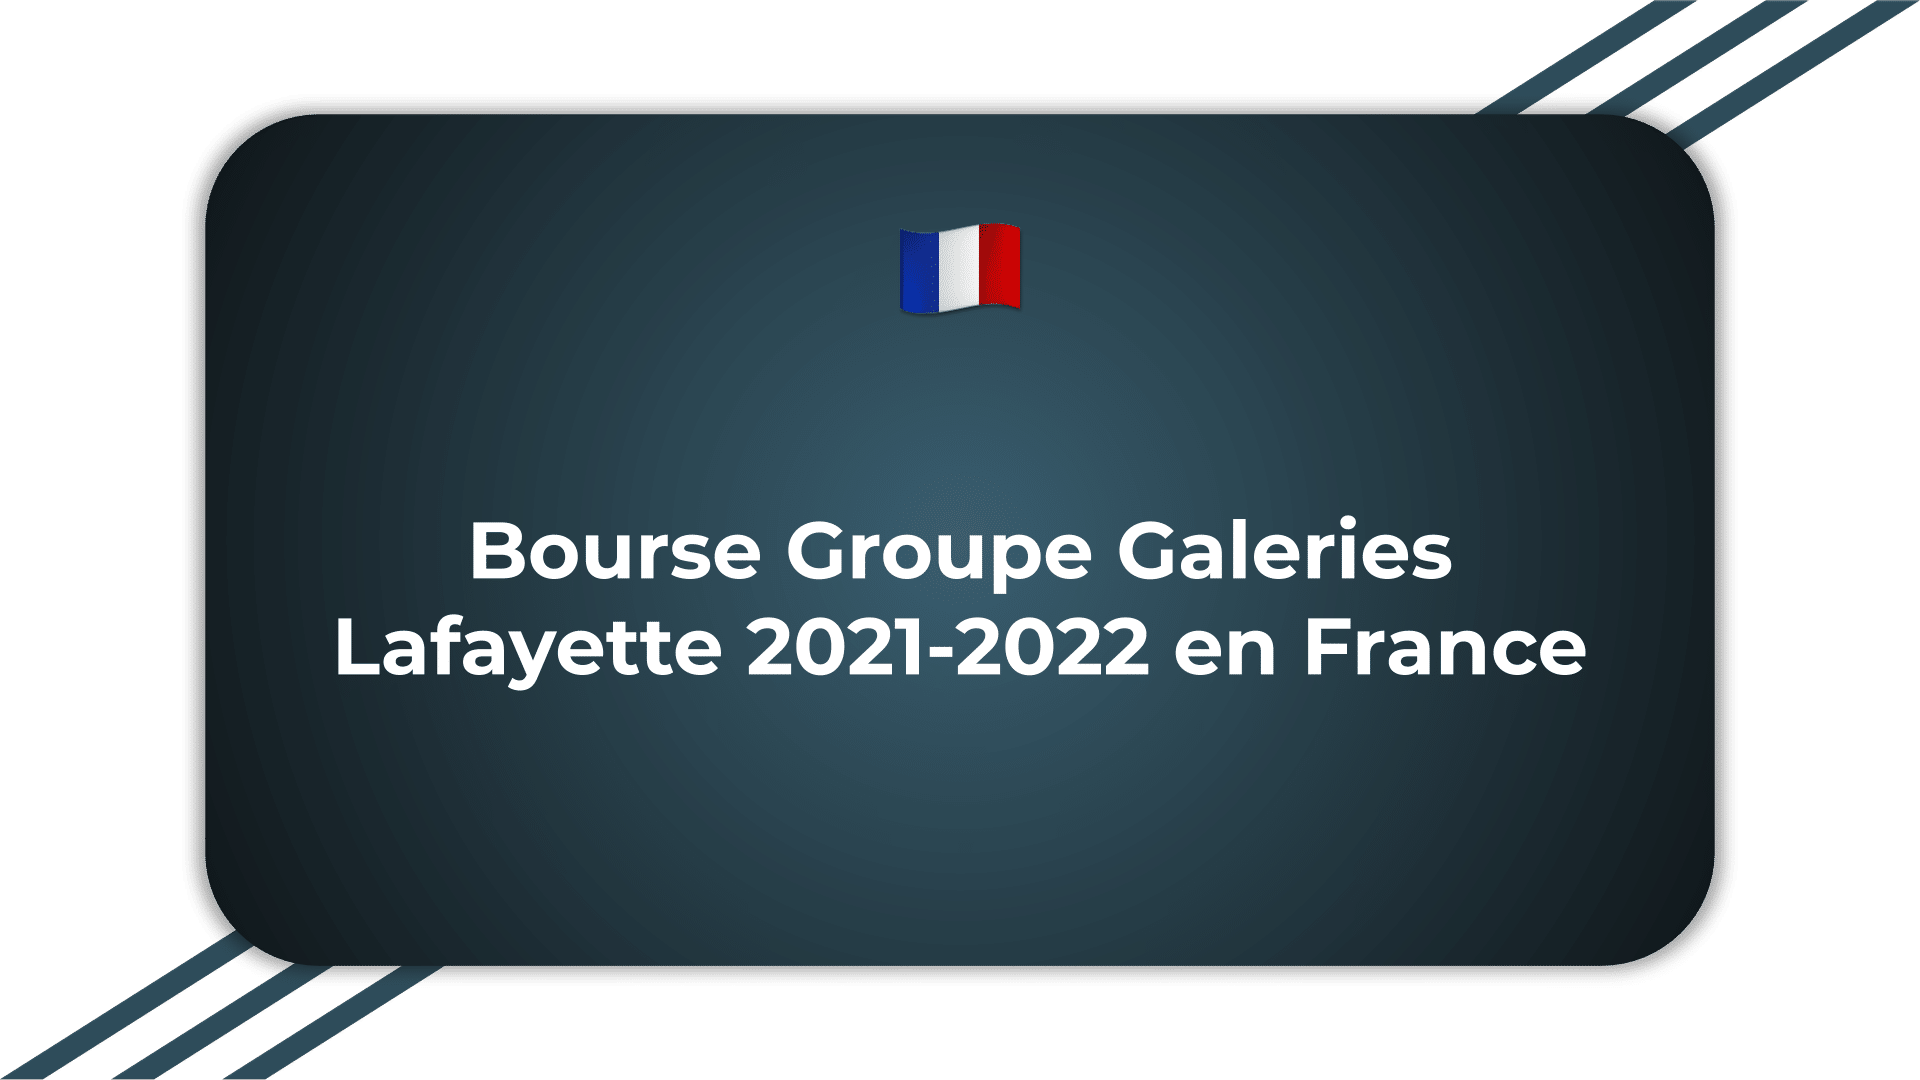 Bourse Groupe Galeries Lafayette